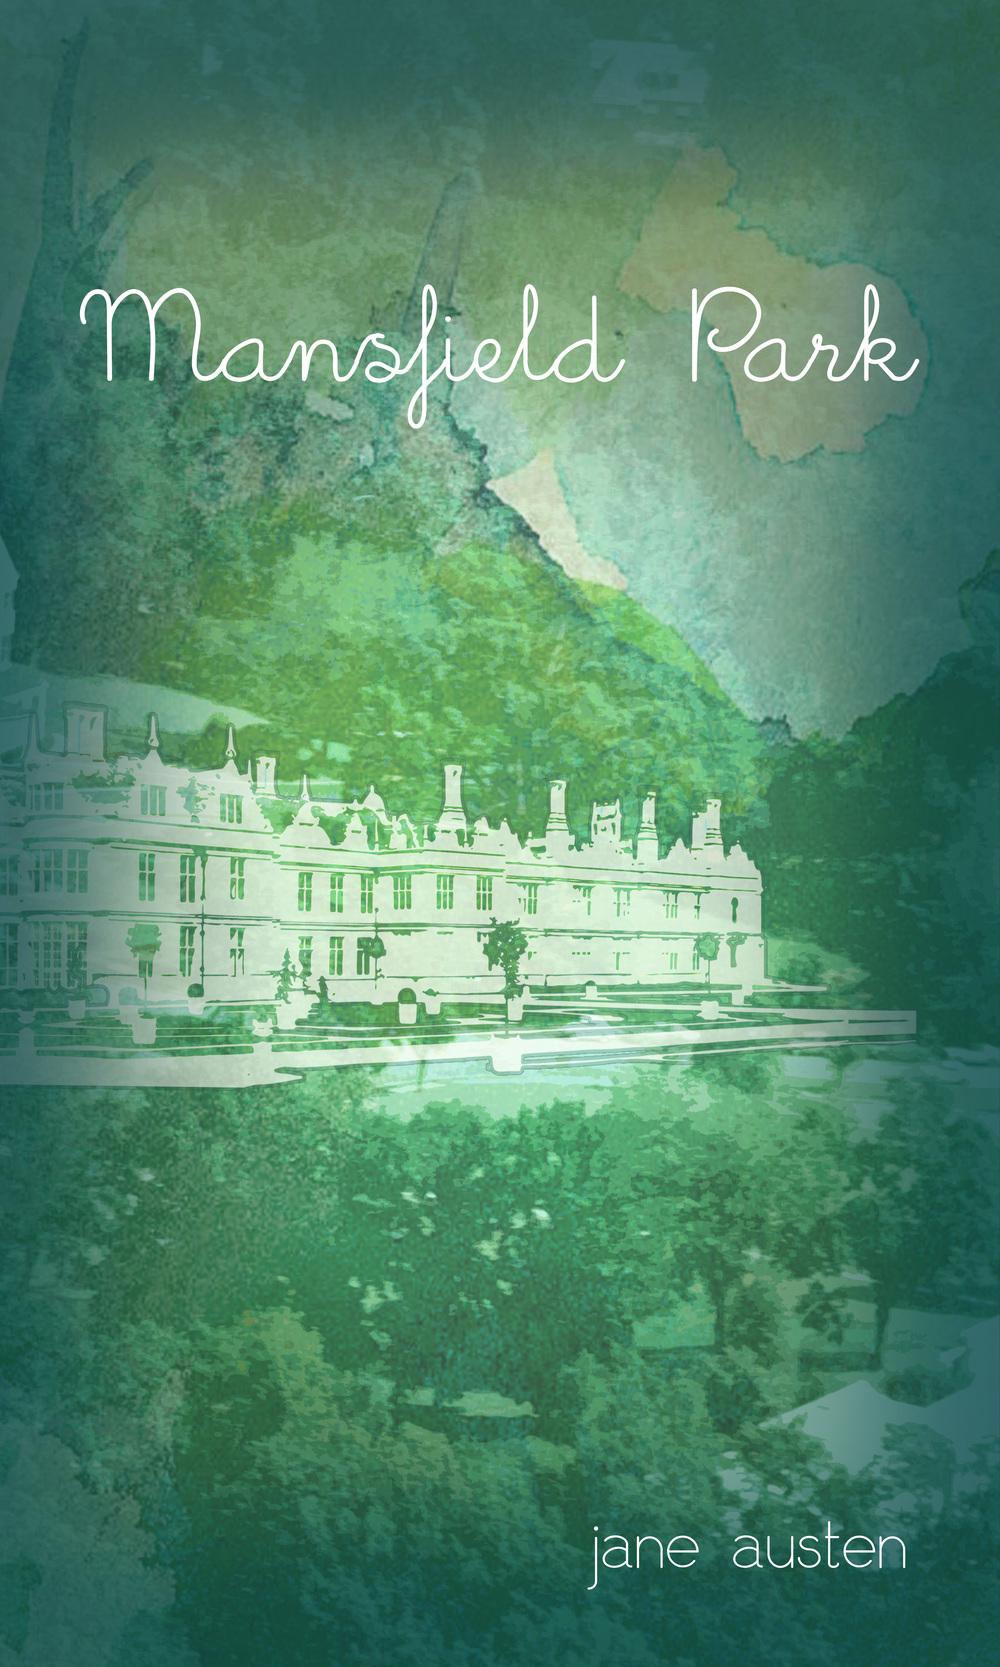 MansfieldPark.jpg